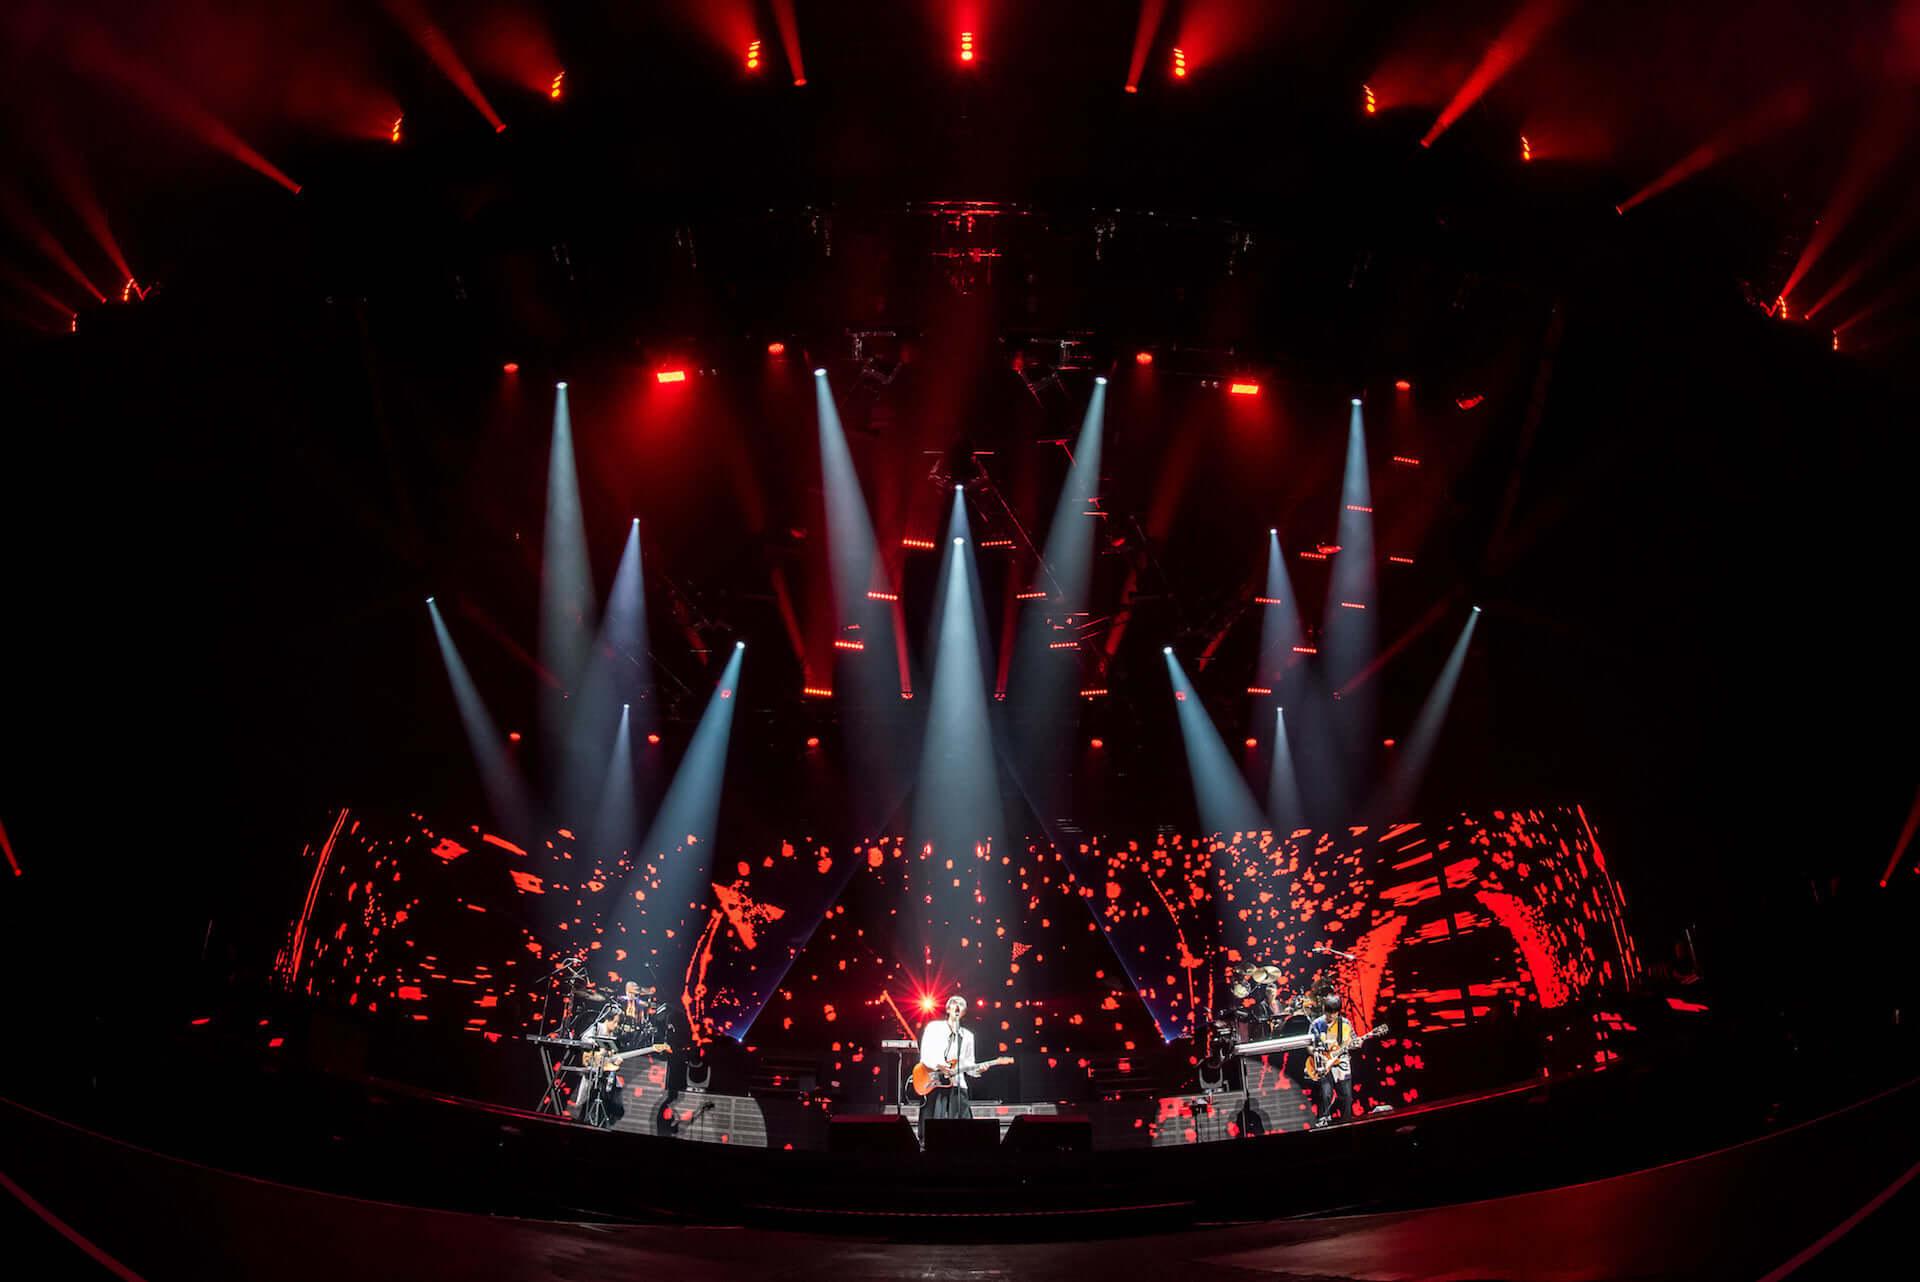 RADWIMPS横浜アリーナ公演のライブ写真が公開!<ANTI ANTI GENERATION TOUR 2019>レポート music190830_radwimps_live_8-1920x1282